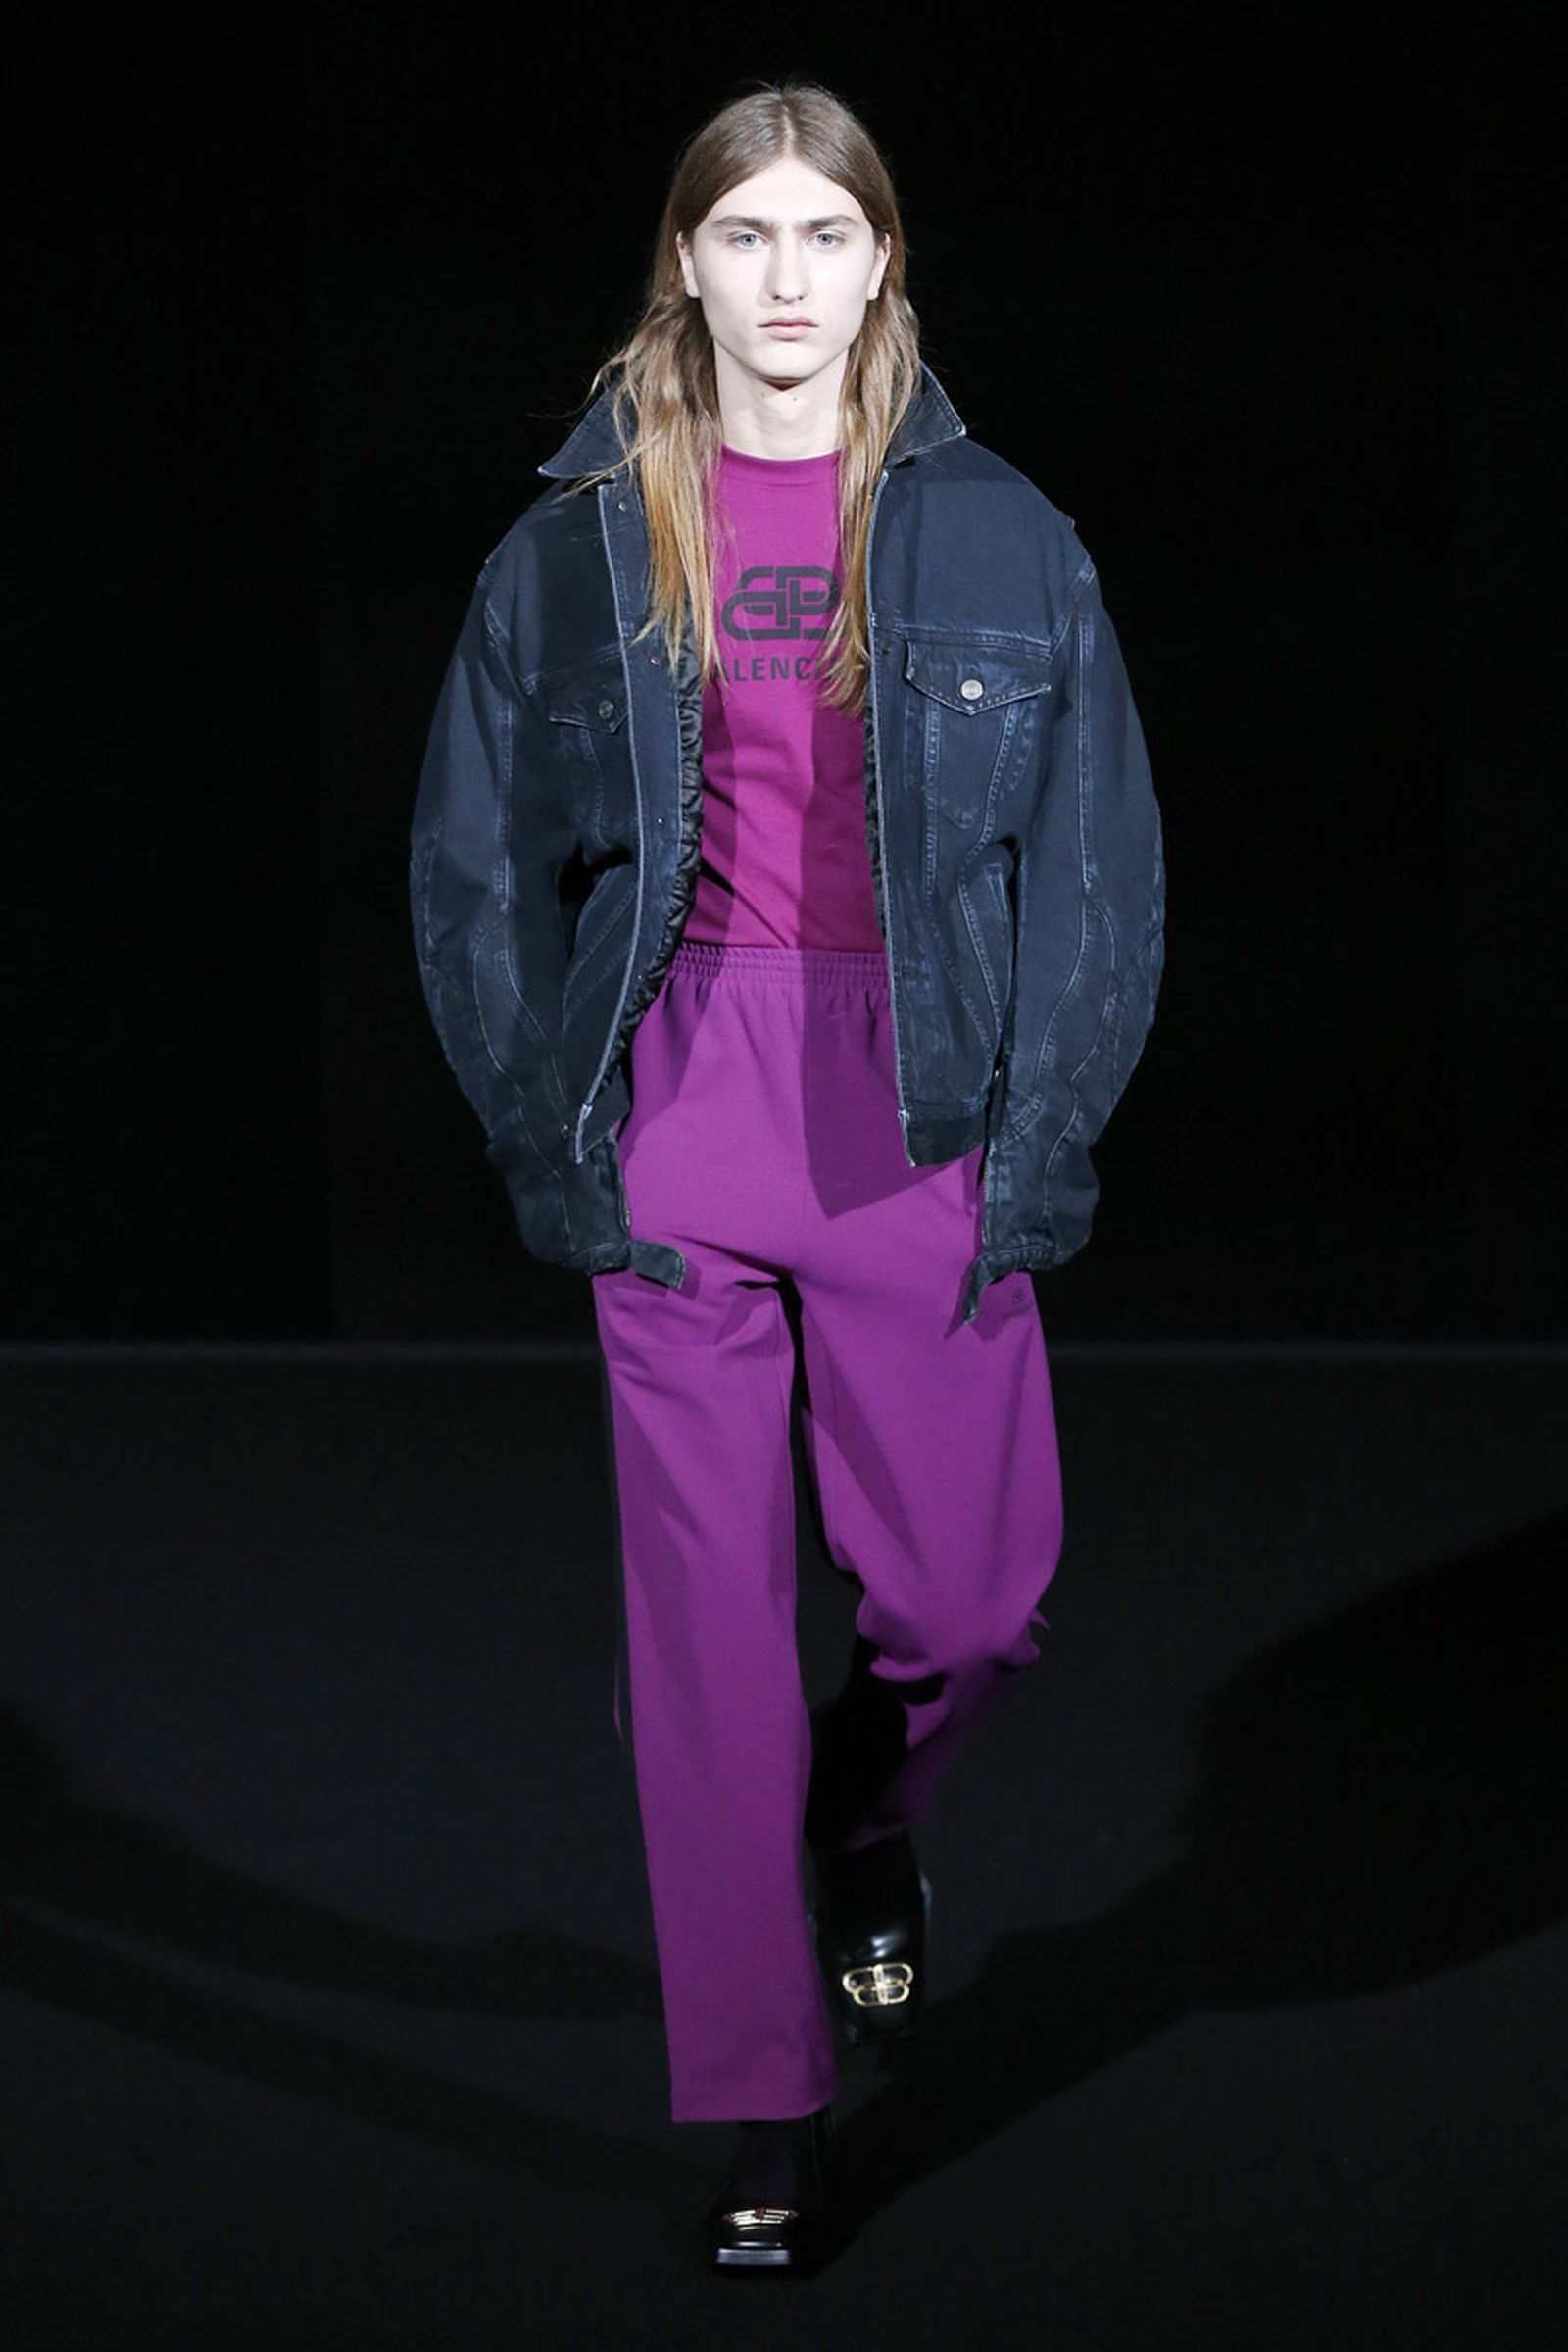 Balenciaga : Runway Paris Fashion Week Womenswear Fall/Winter 2019/2020